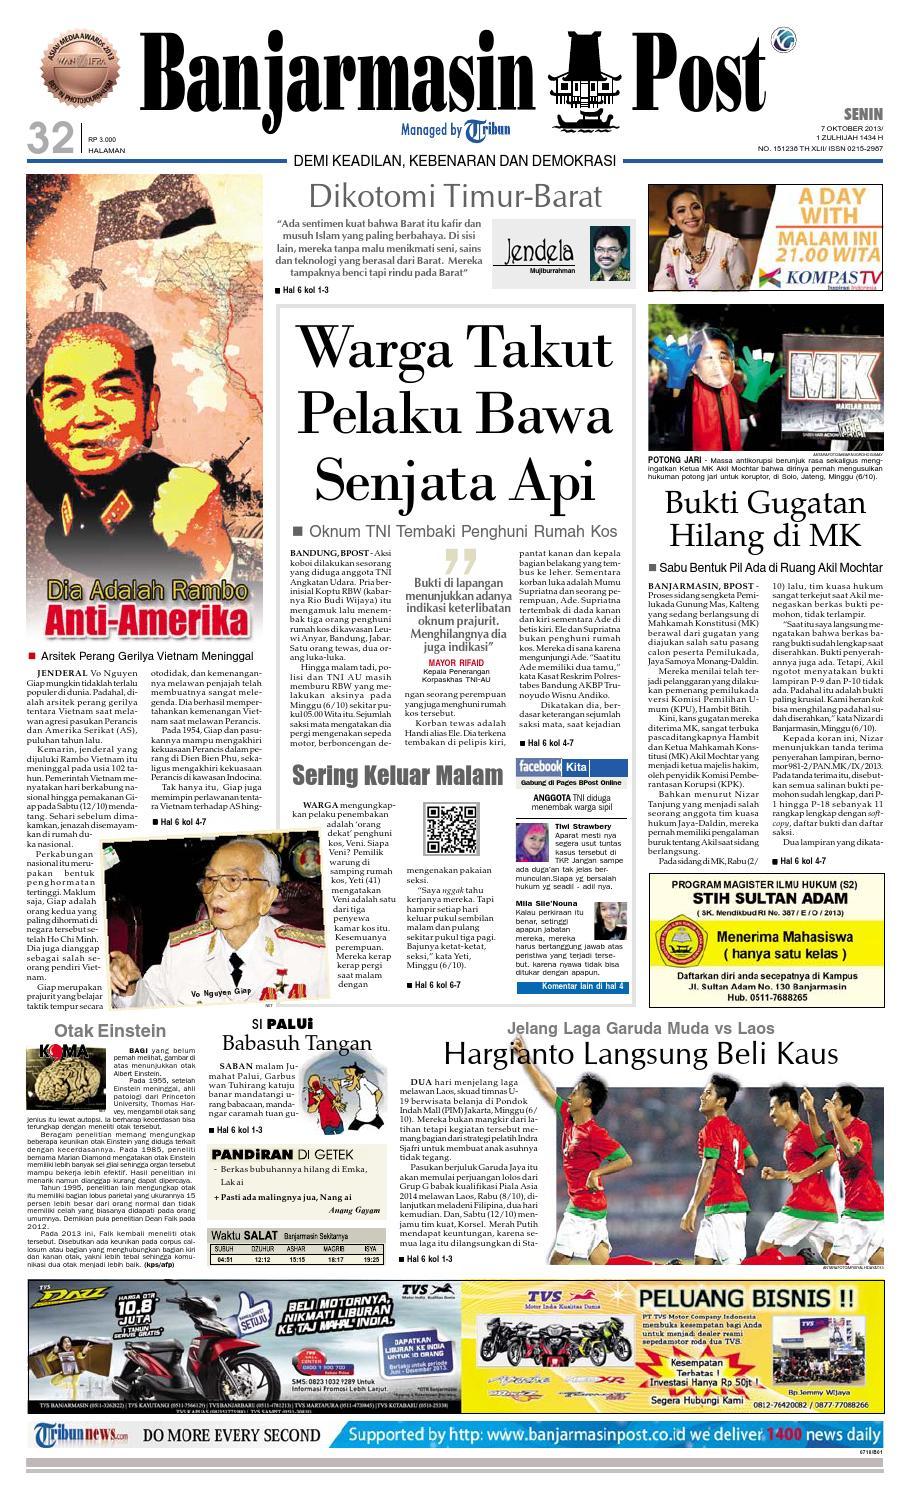 Banjarmasin Post Senin 7 Oktober 2013 By Issuu Charger Warna Warni Merk Hasan Sj0048